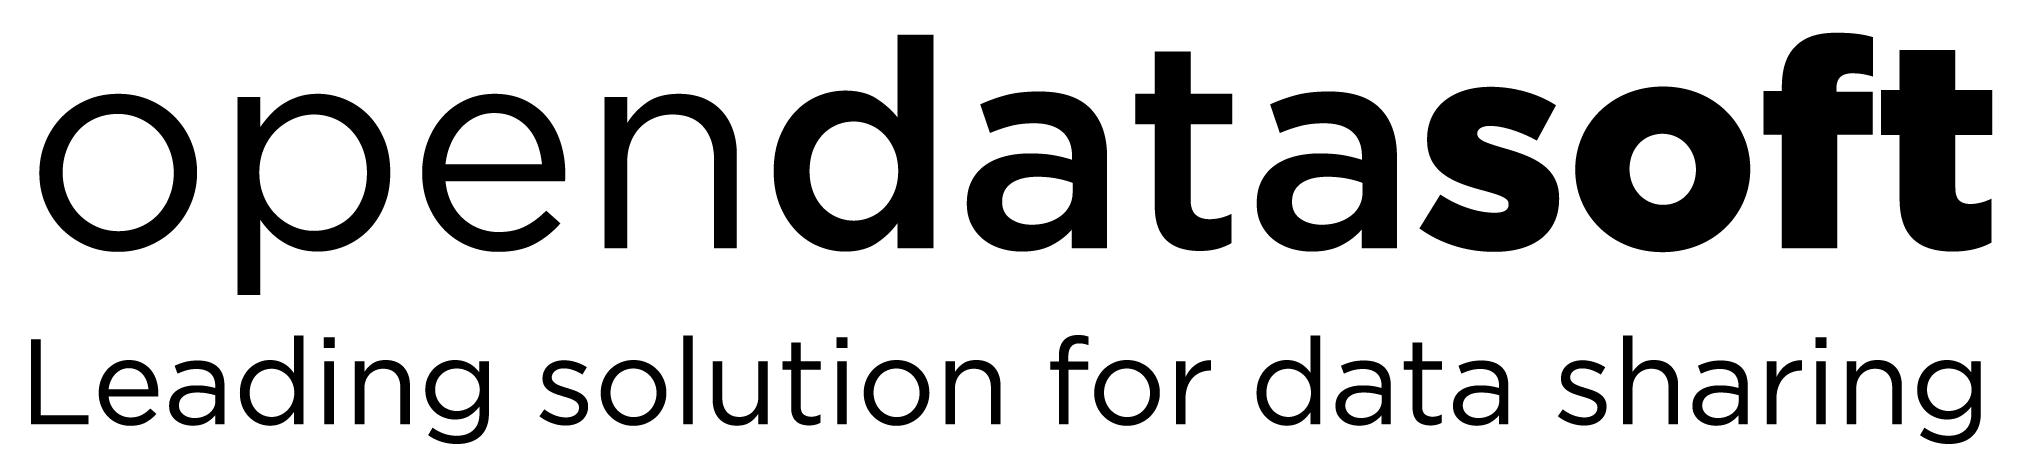 Opendatasoft